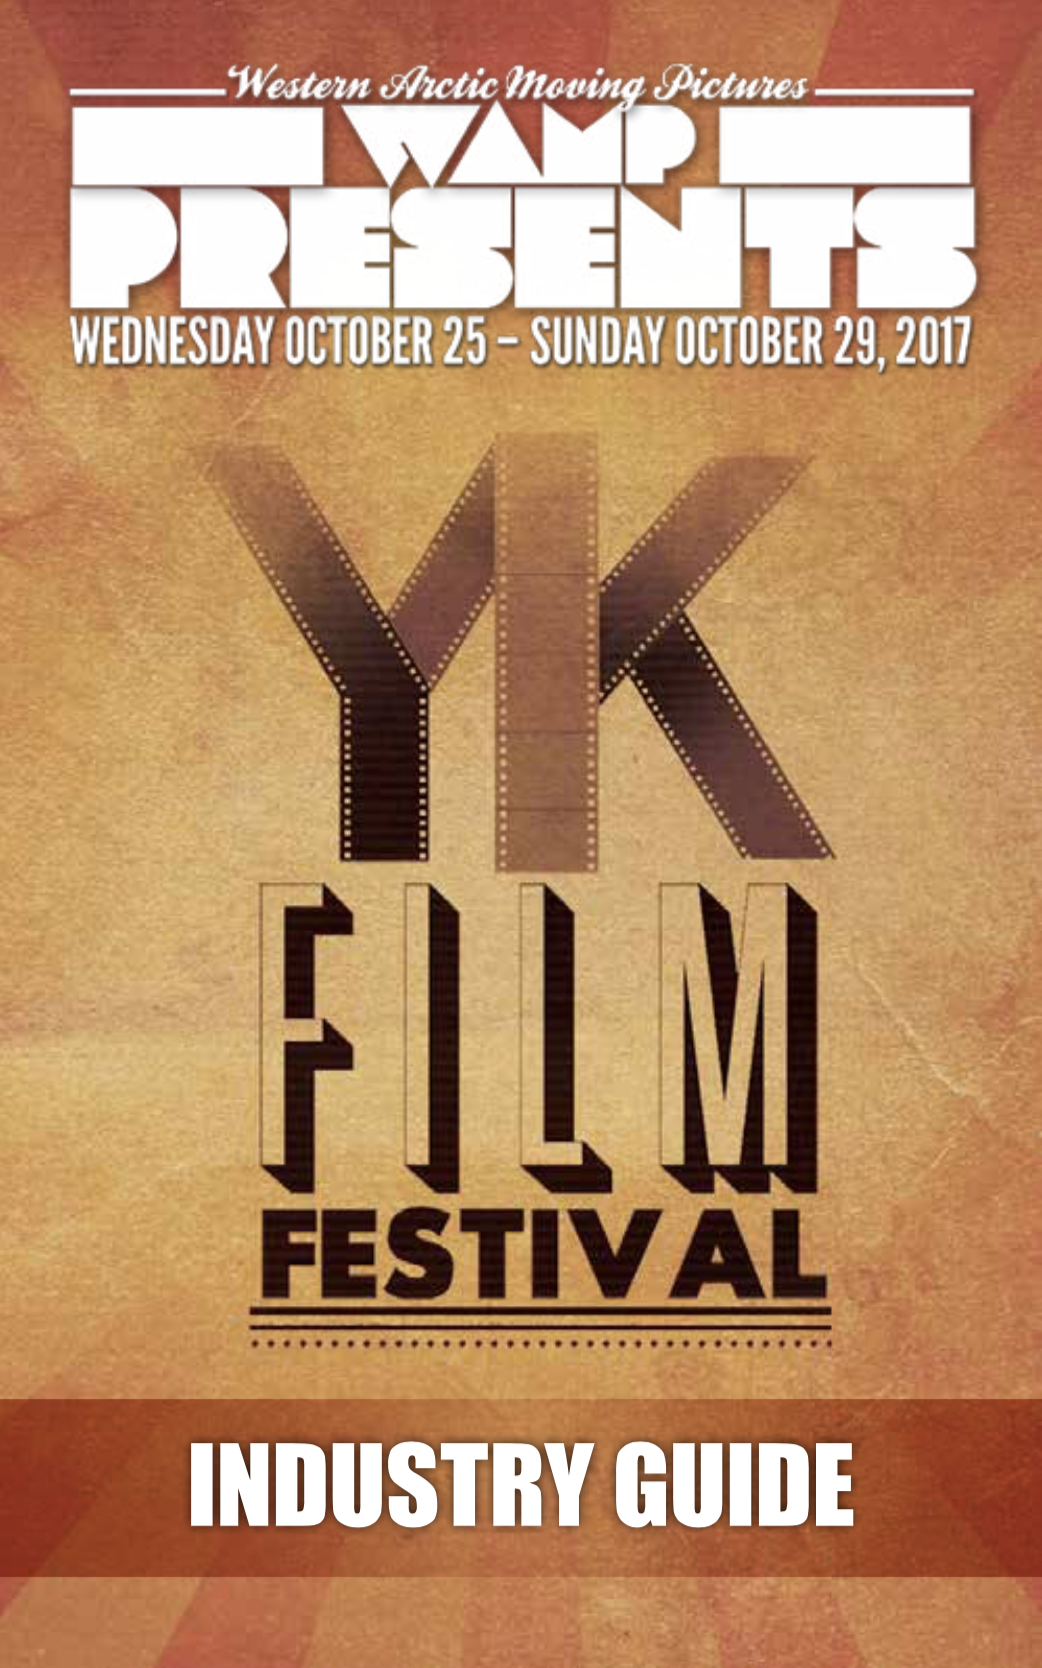 2017 YK Film Festival Industry Guide (PDF)